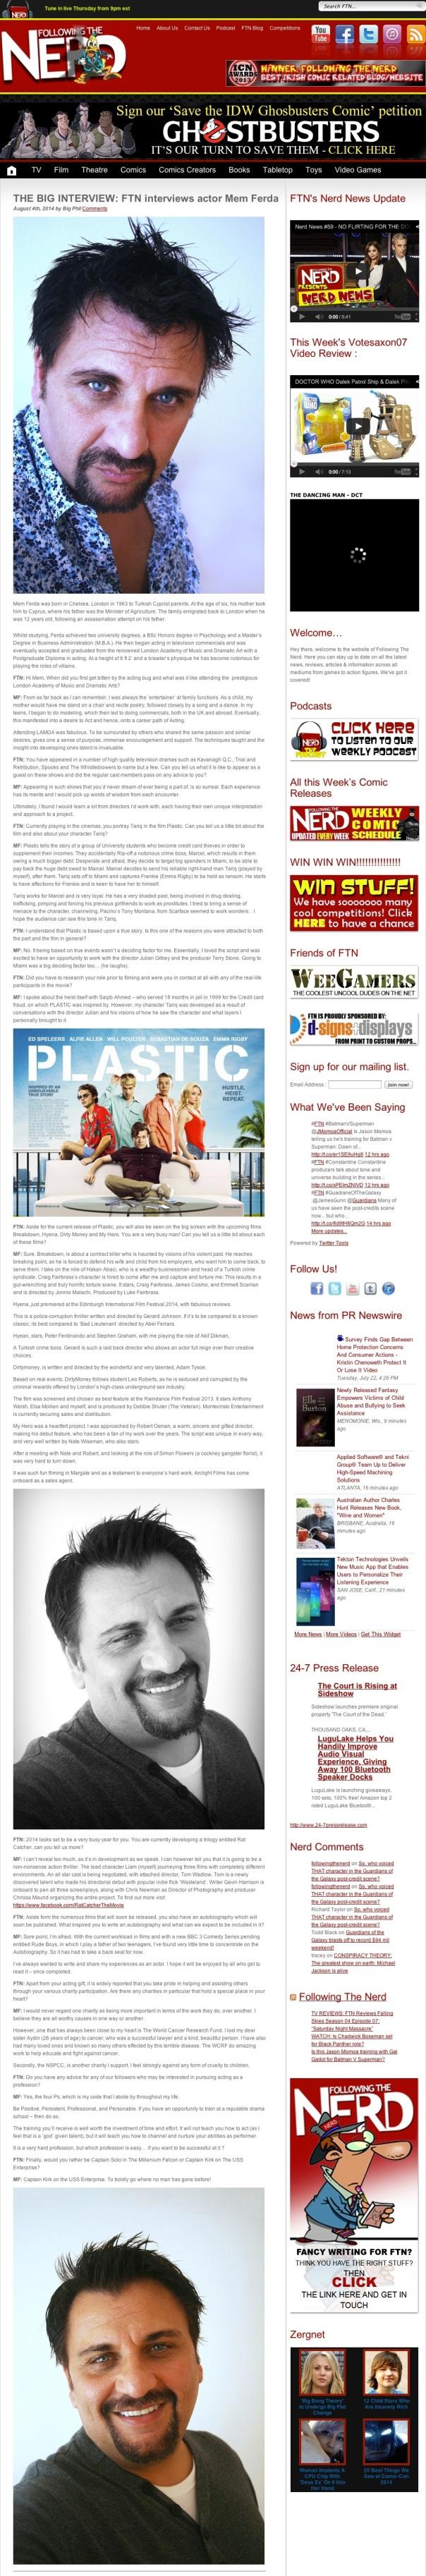 THE BIG INTERVIEW: FTN interviews actor Mem Ferda